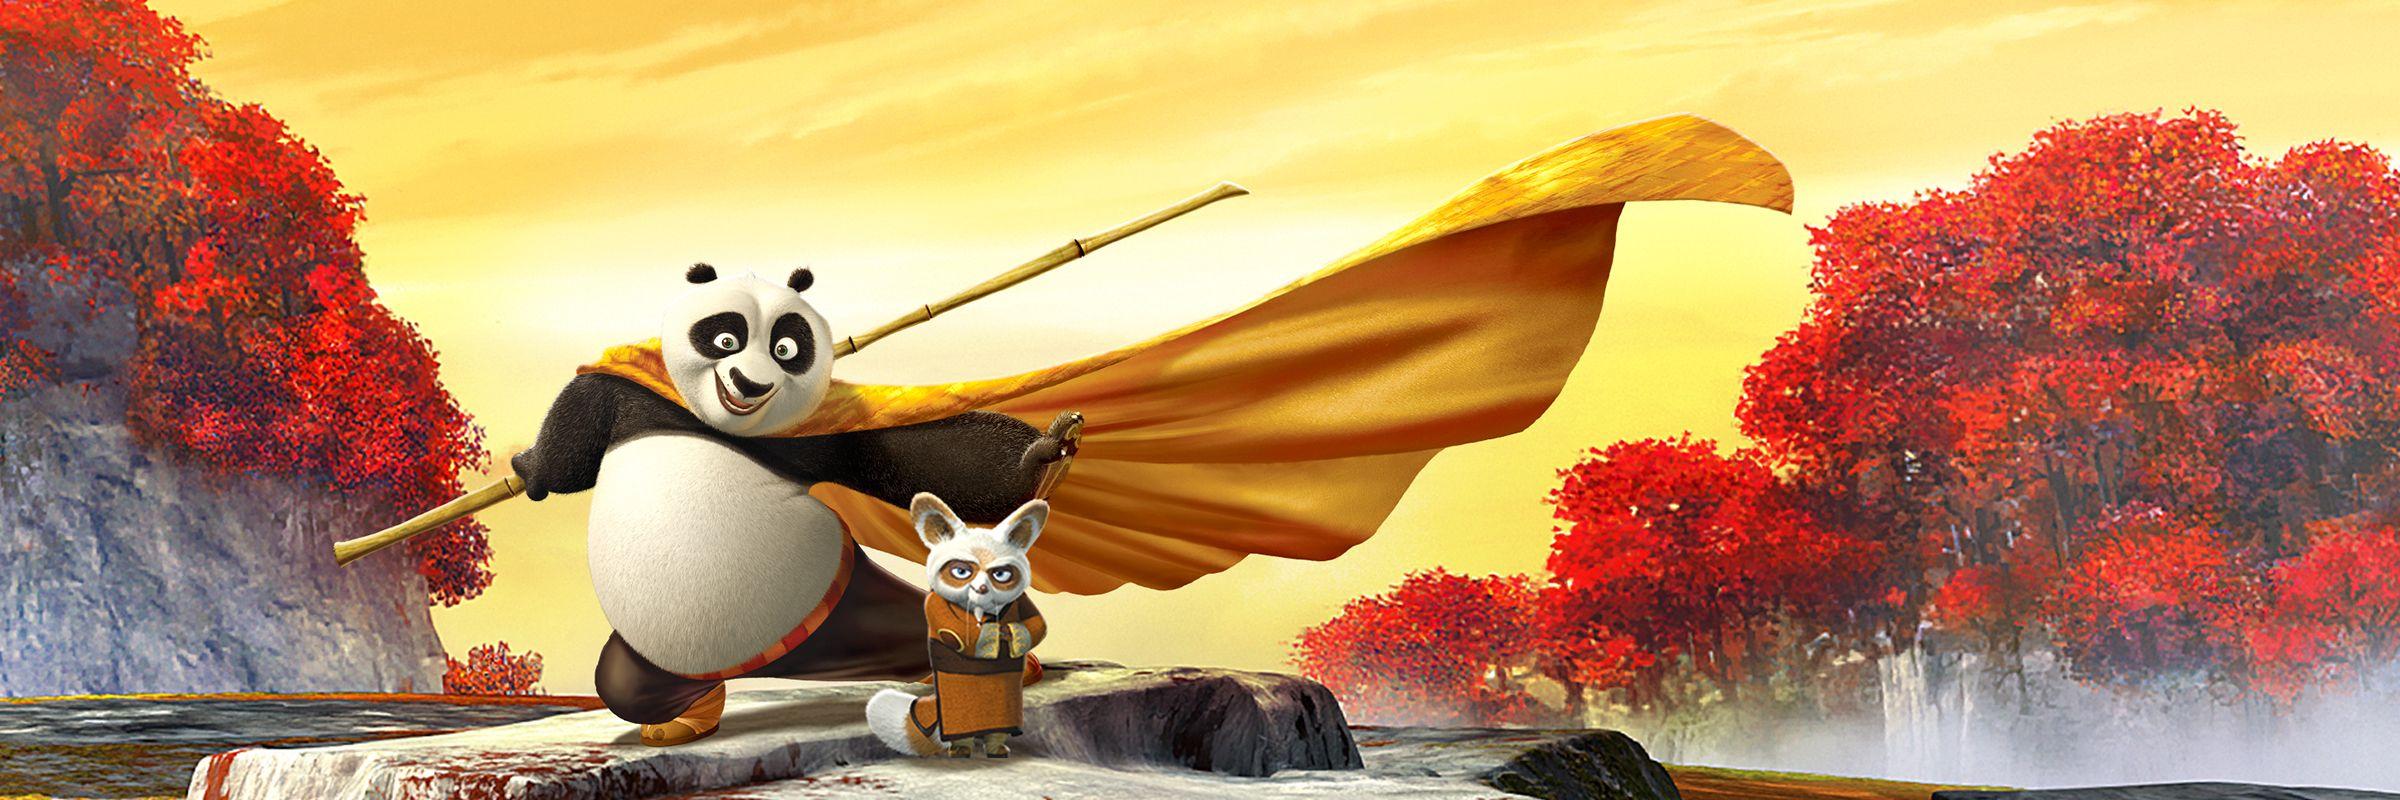 Animation Cartoon Full Movie kung fu panda   full movie   movies anywhere